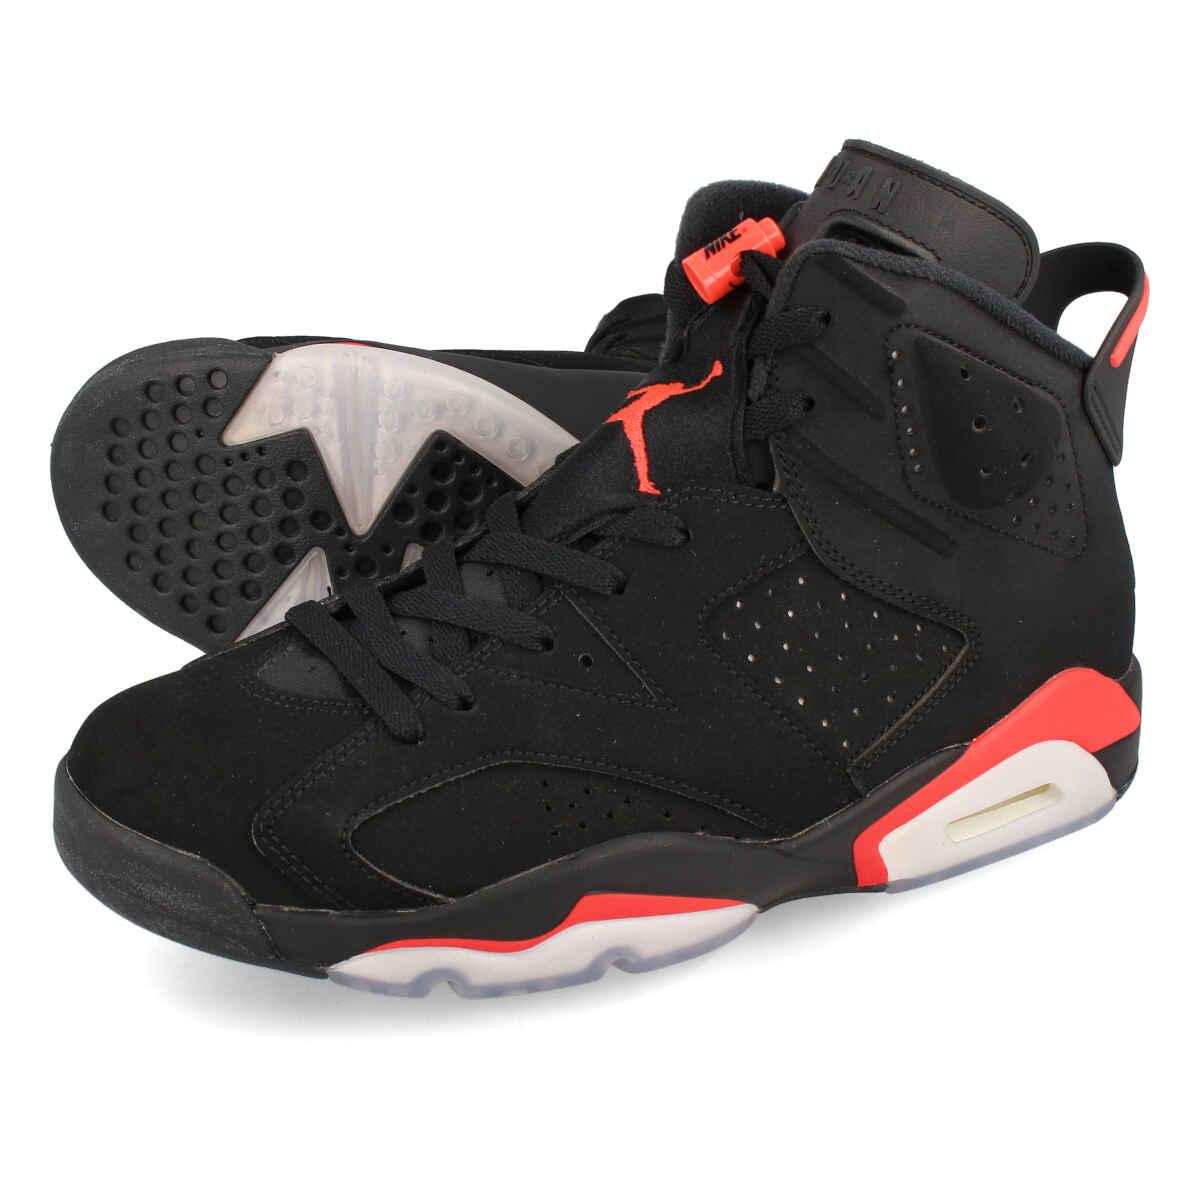 5bb28490a84f NIKE AIR JORDAN 6 RETRO Nike Air Jordan 6 nostalgic BLACK INFRARED 384